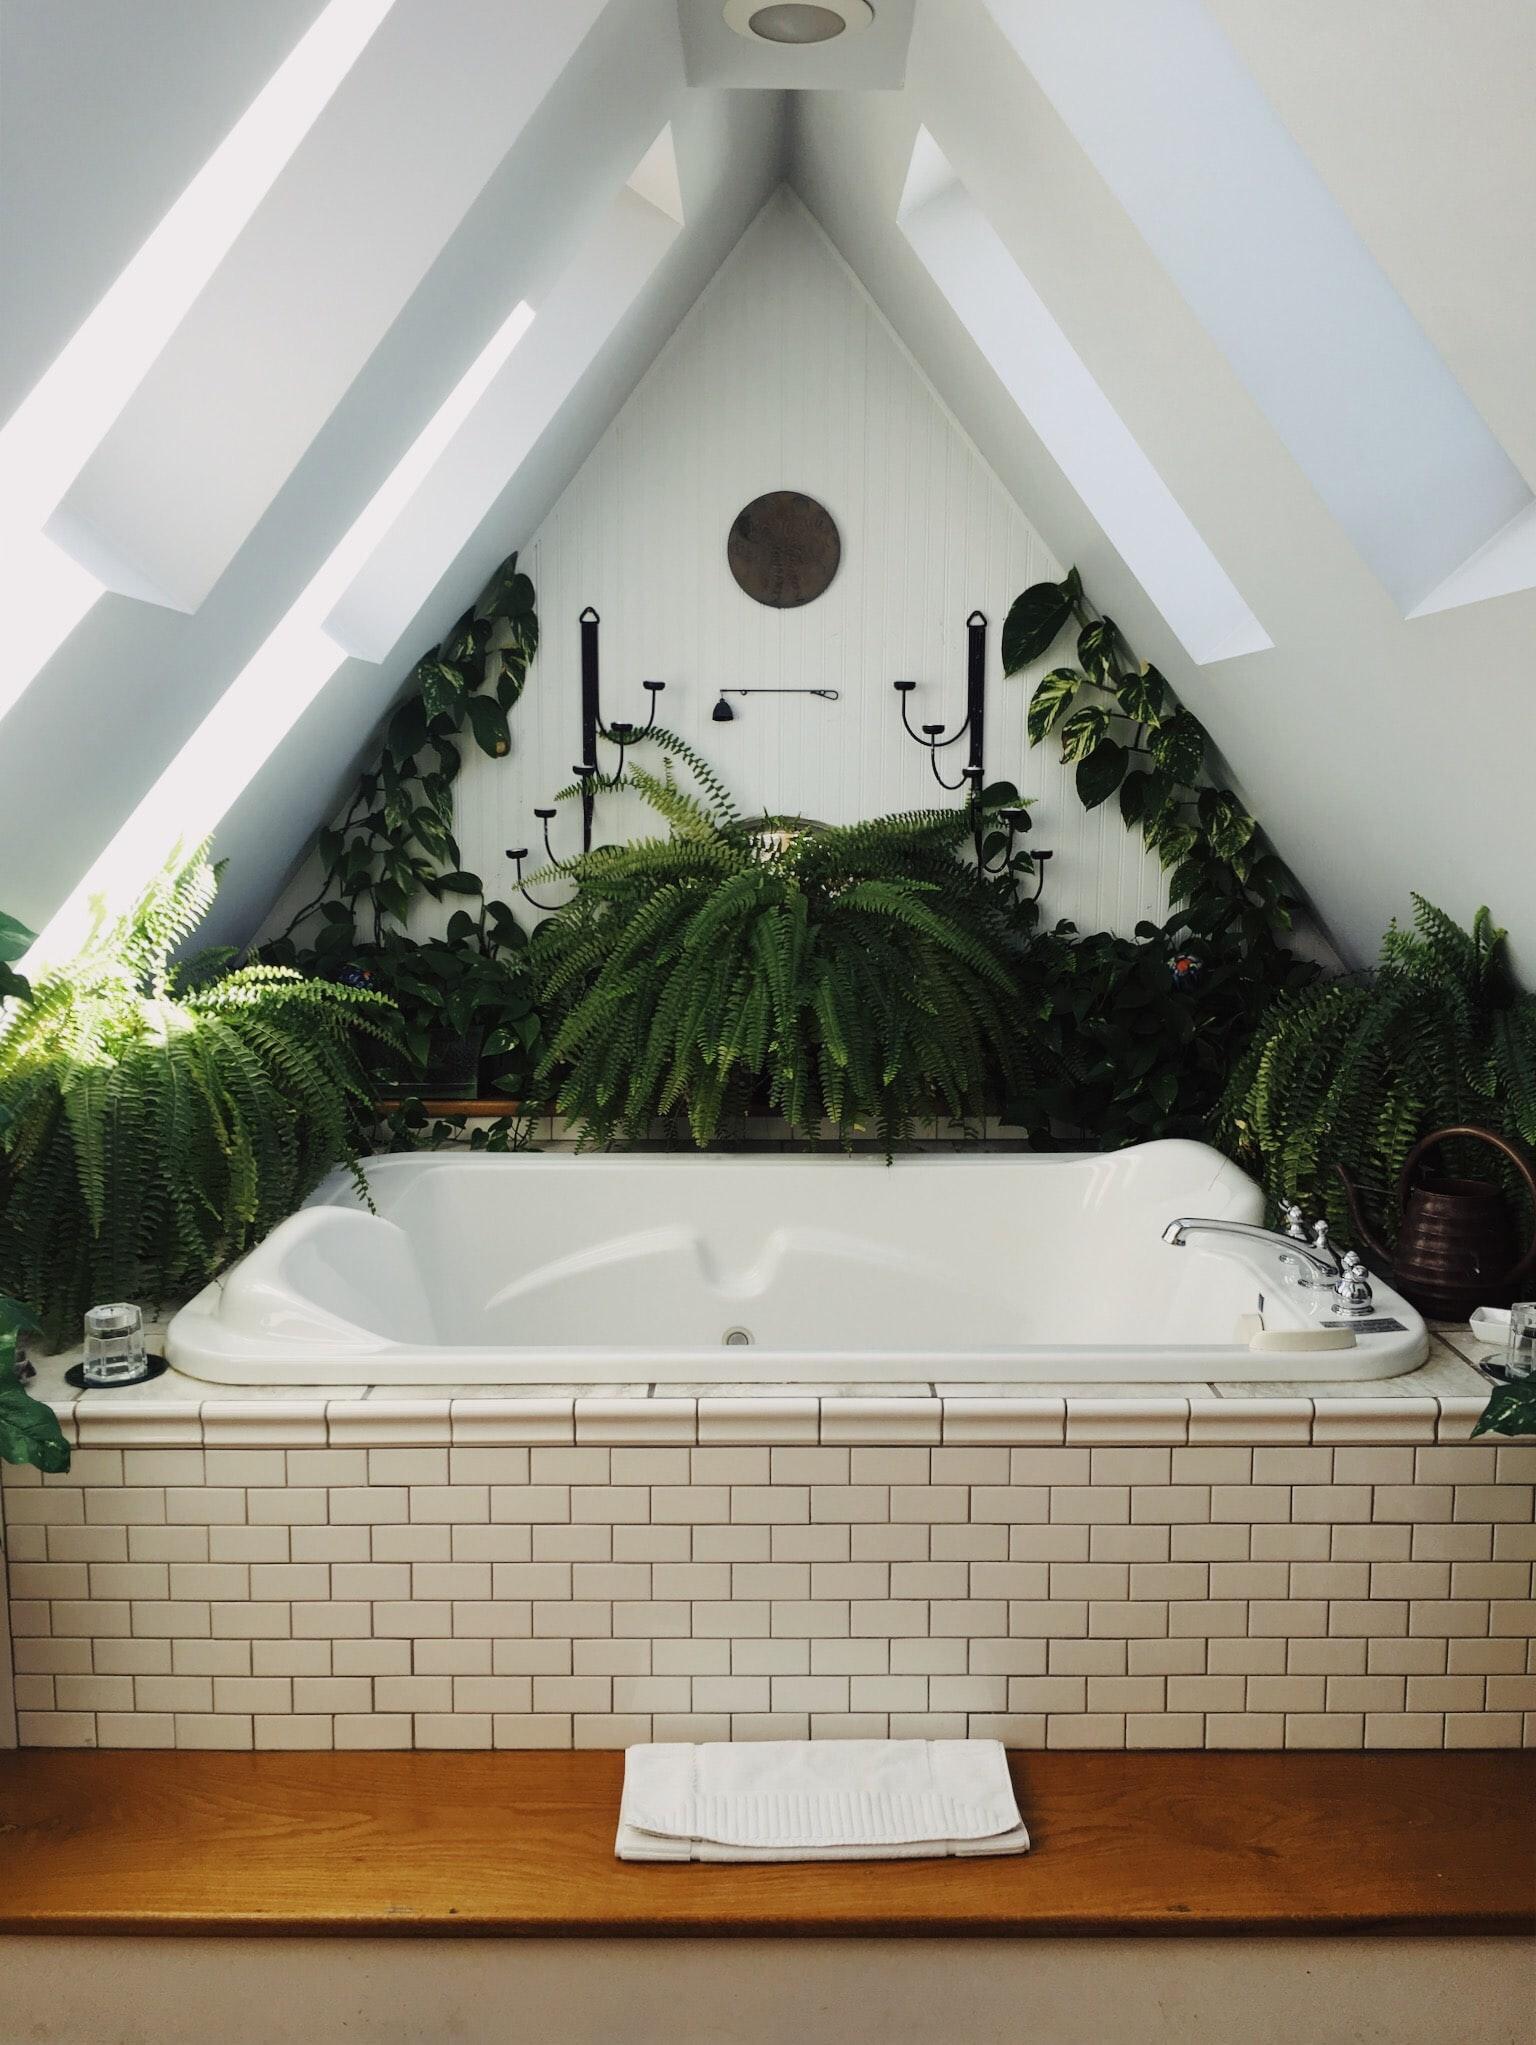 Risky business: Ποια είναι τα τέσσερα σημεία στο μπάνιο που πάντα ξεχνάμε να καθαρίσουμε